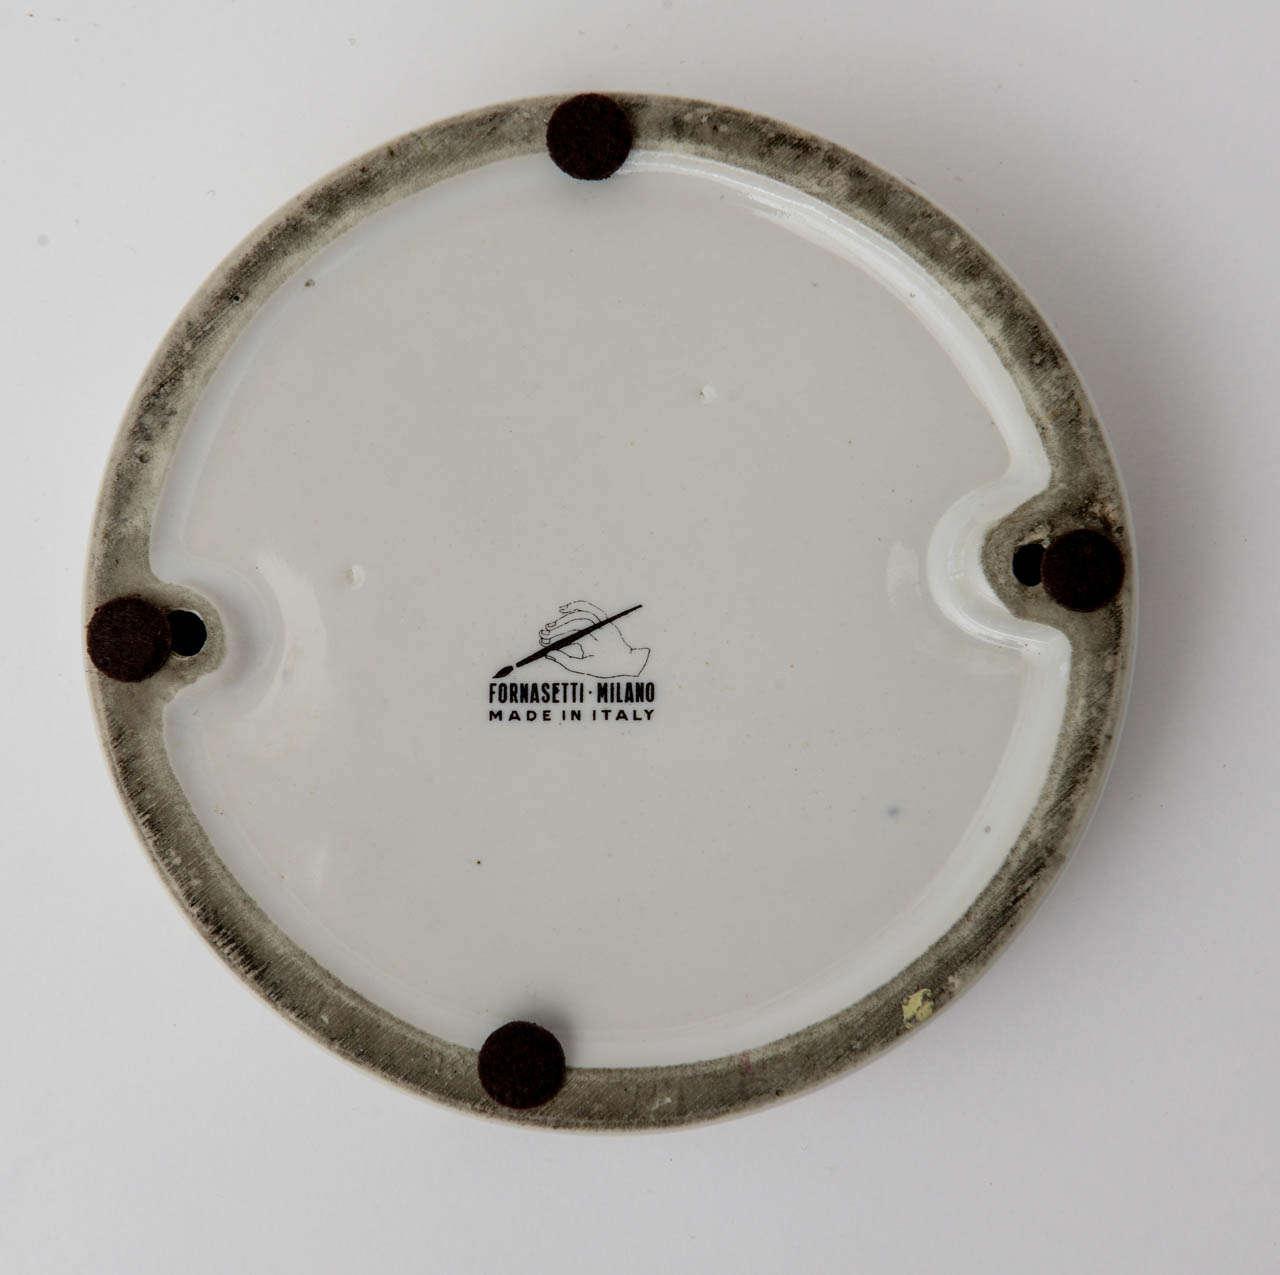 Piero Fornasetti Porcelain Bowl Mid-Century Modern For Sale 3